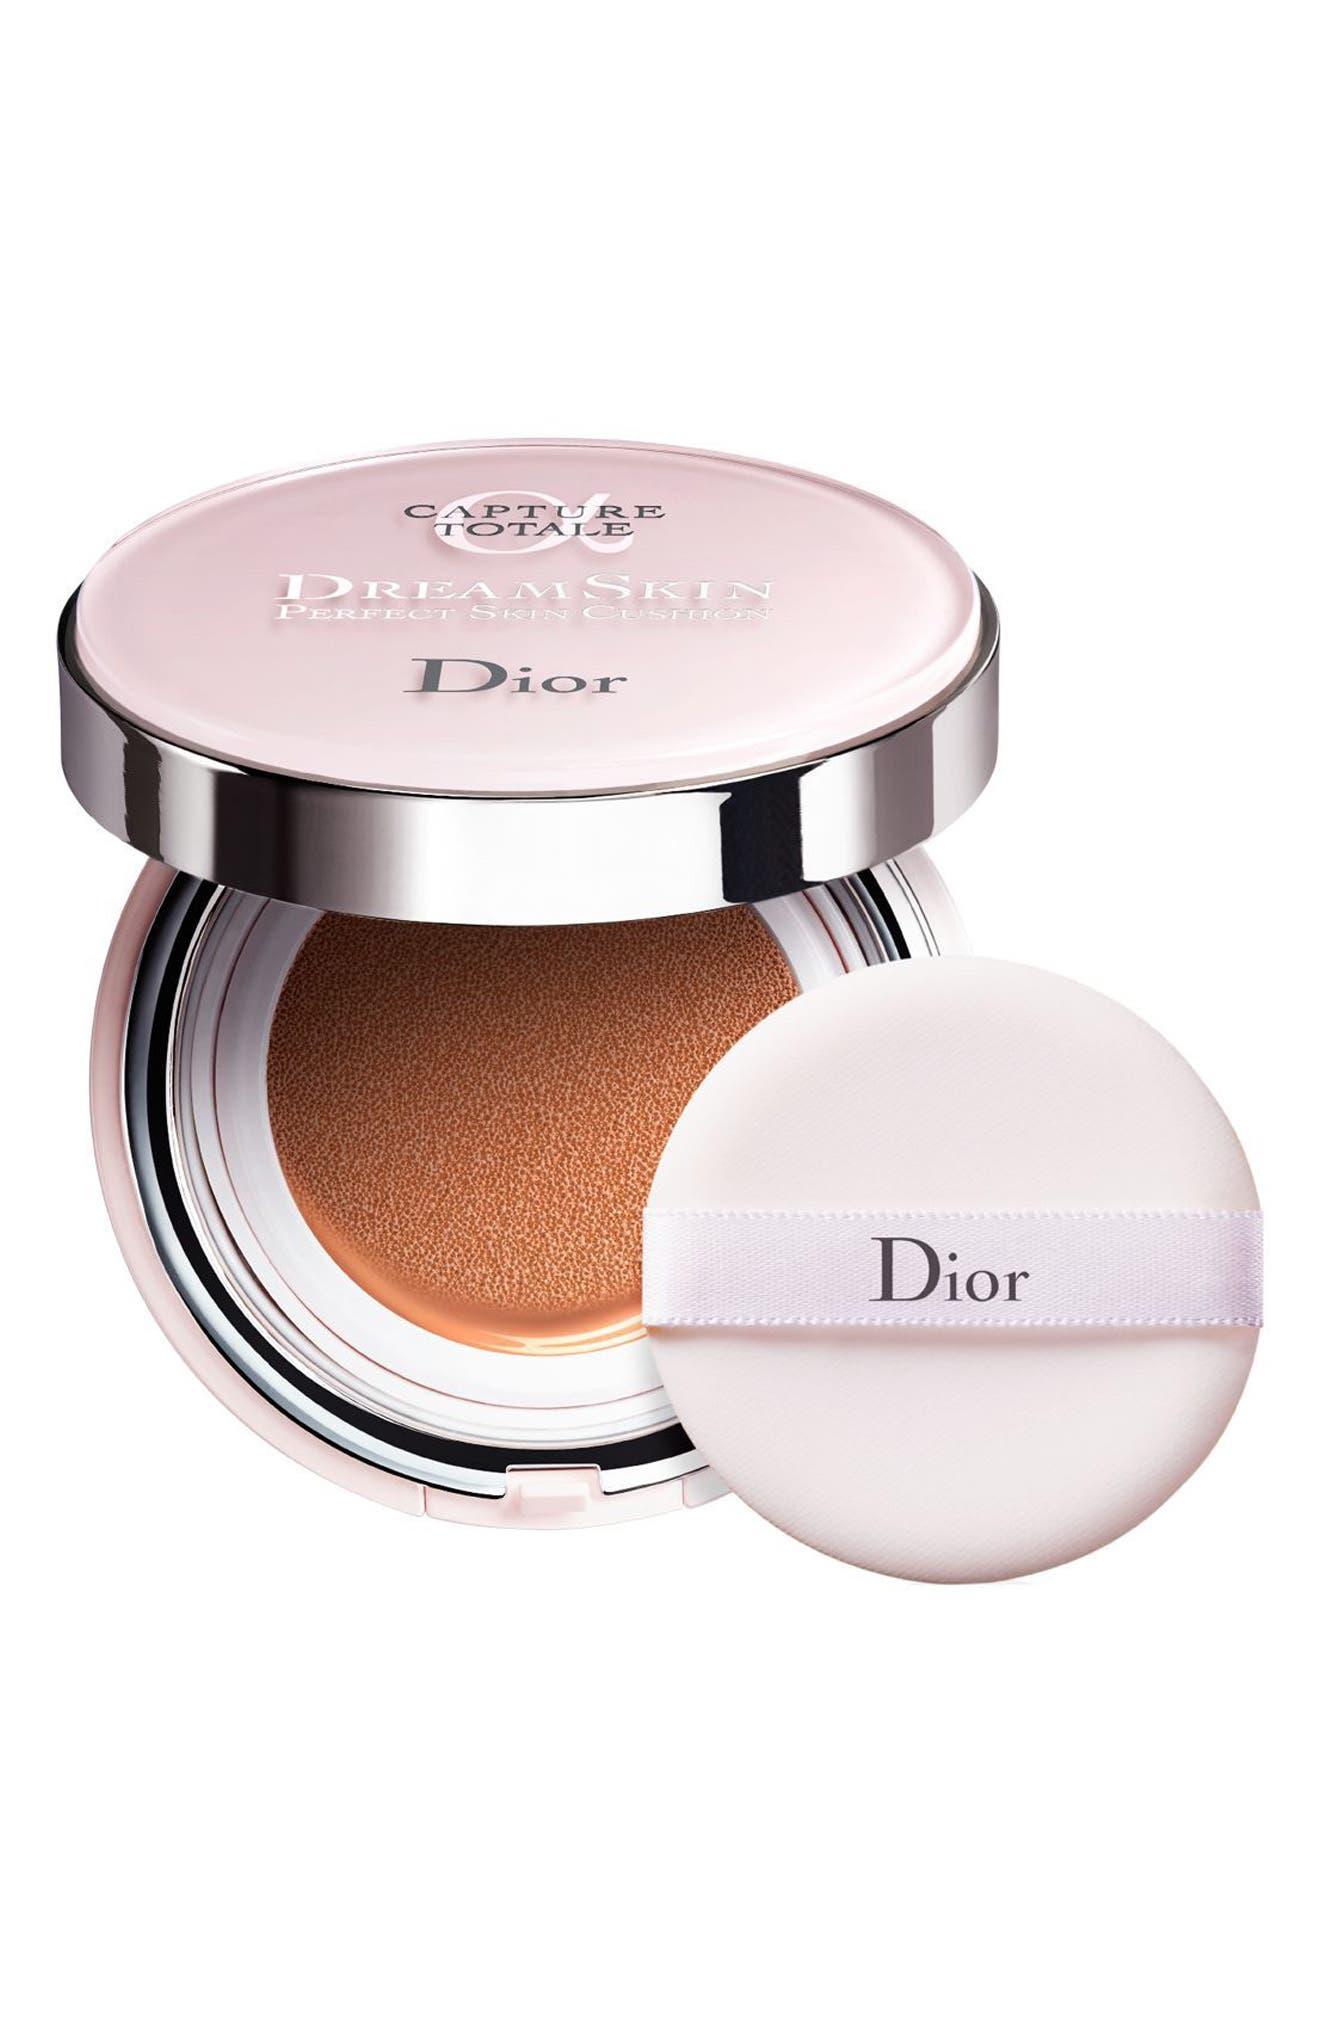 Dior Capture Totale Dreamskin Perfect Skin Cushion Broad Spectrum SPF 50